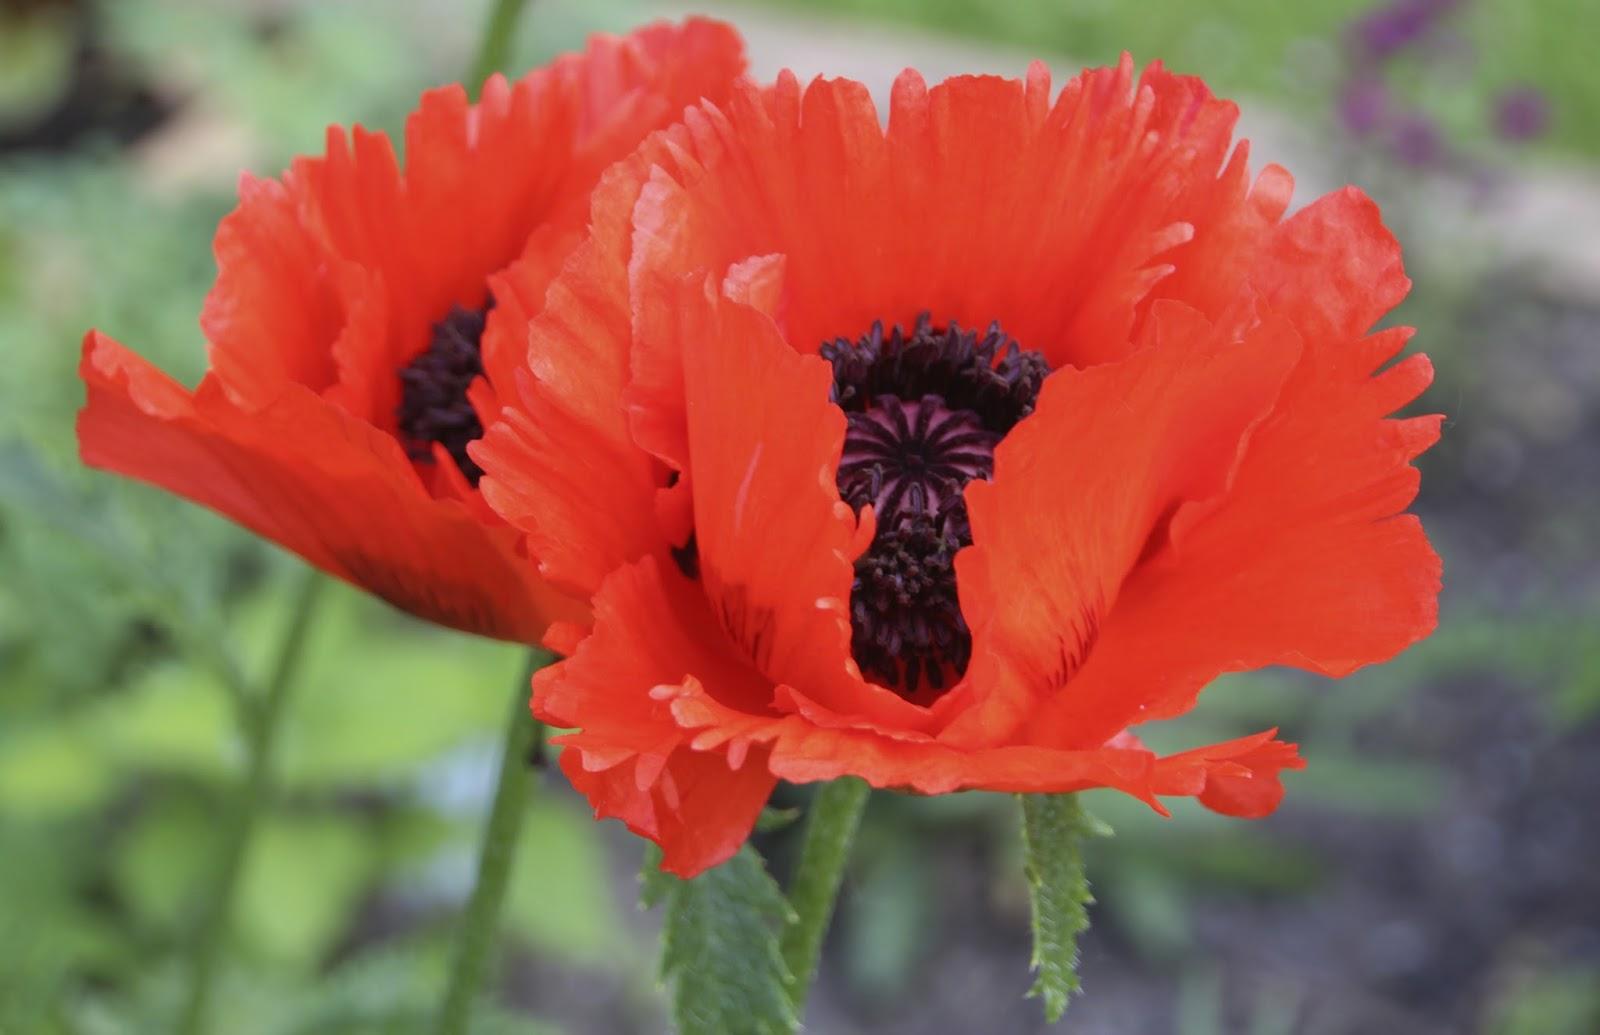 VISUAL SAINT PAUL: Armistice Day, Remembrance Day, Veterans Day